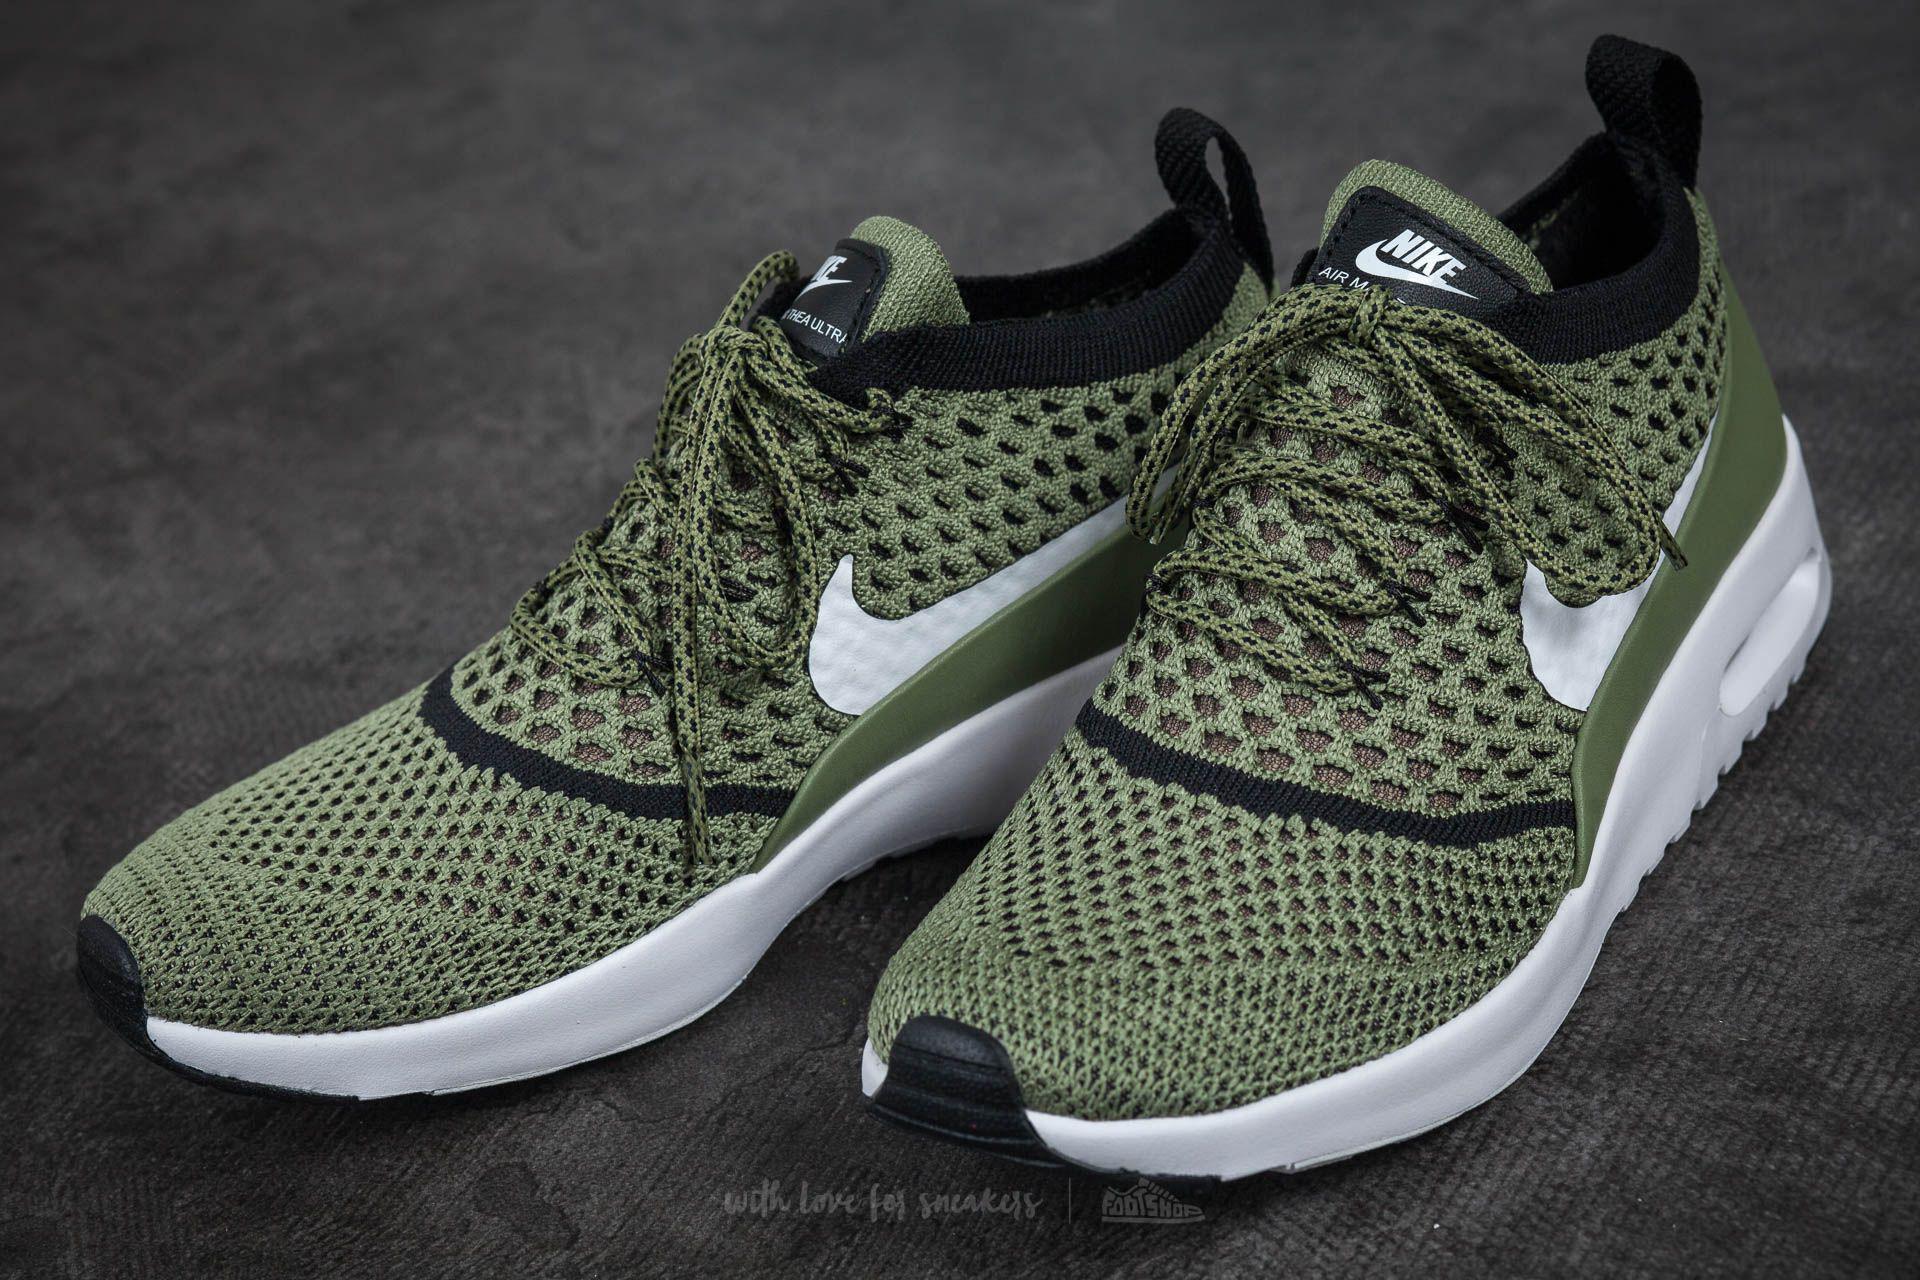 f5ccf4e4de5fd Lyst - Nike Wmns Air Max Thea Ultra Flyknit Palm Green  White-black ...